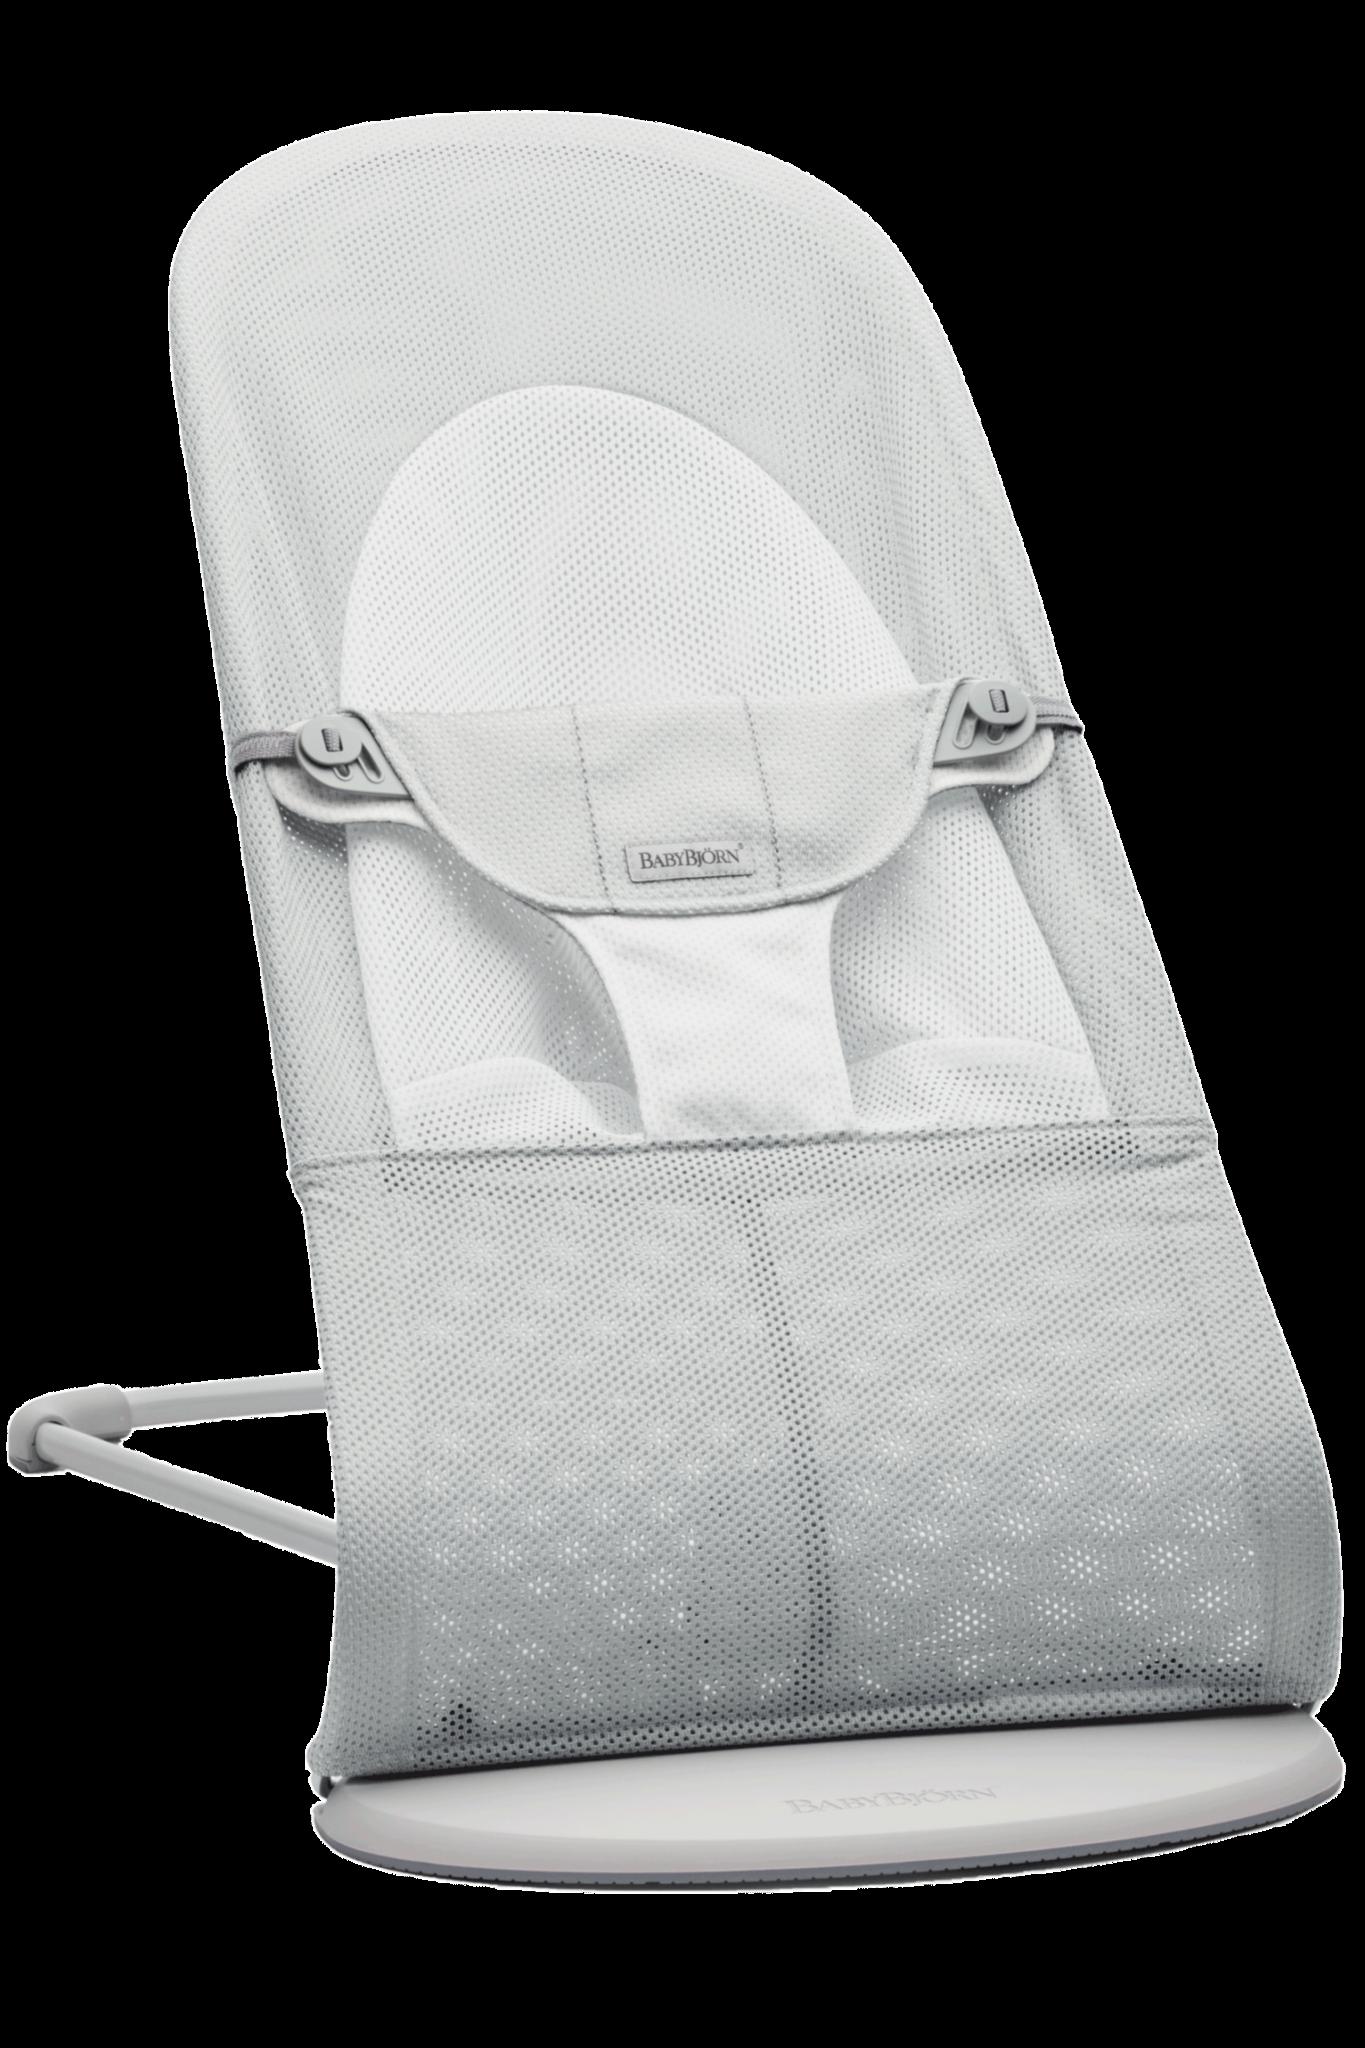 BABYBJÖRN Wipstoeltje Balance Soft Lichtgrijs frame Zilver-Wit Mesh